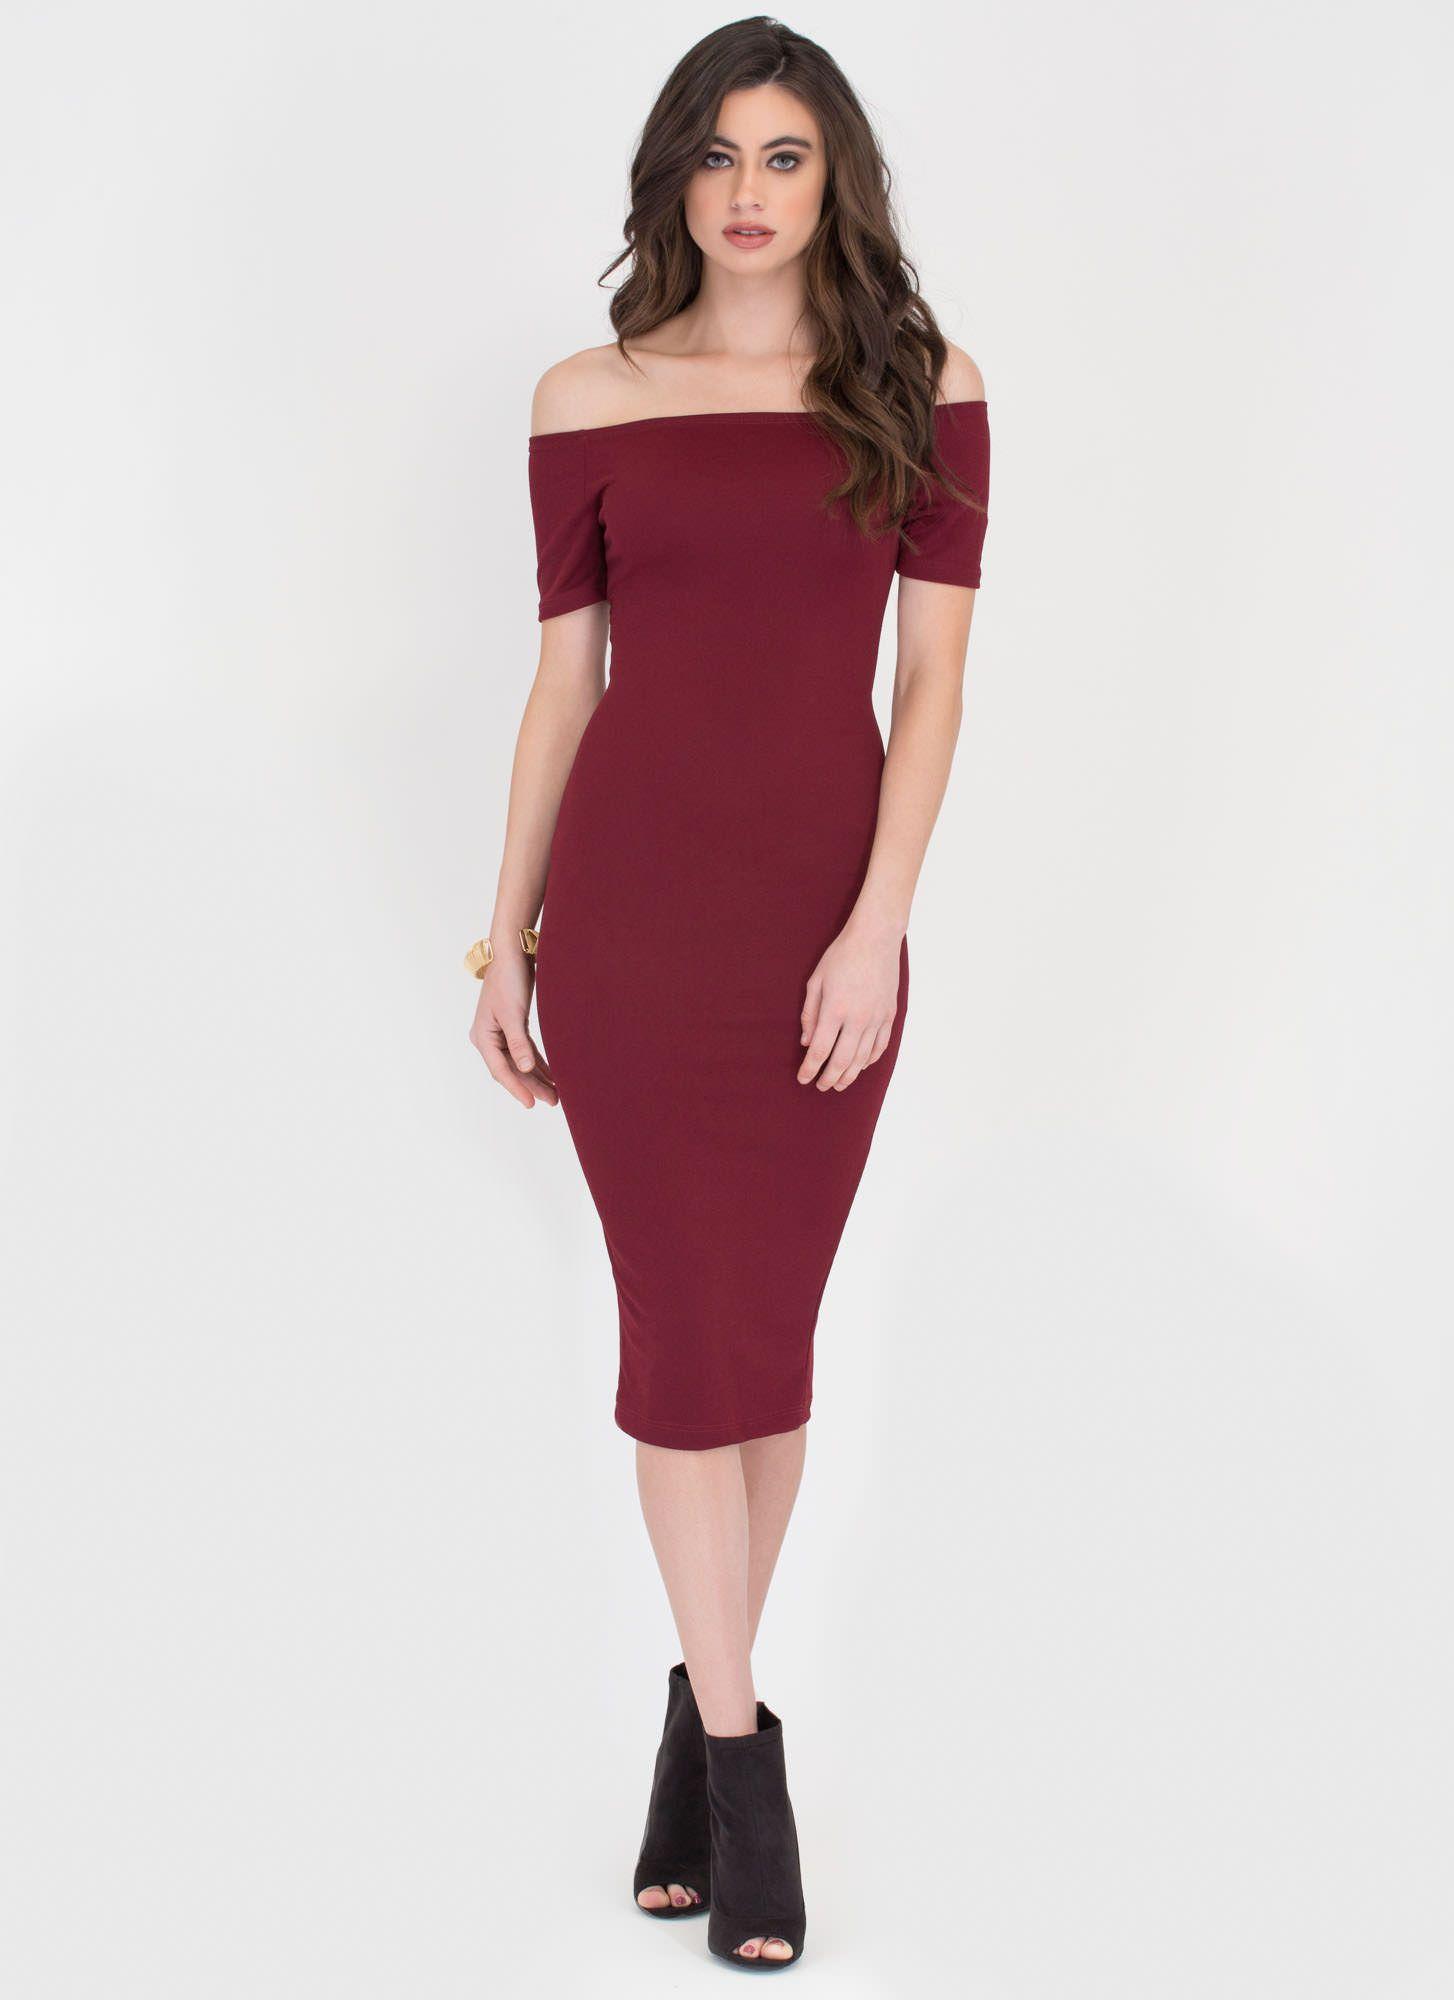 f41a4e234b5e Bardot Babe Off-Shoulder Midi Dress BLACK WINE - GoJane.com ...